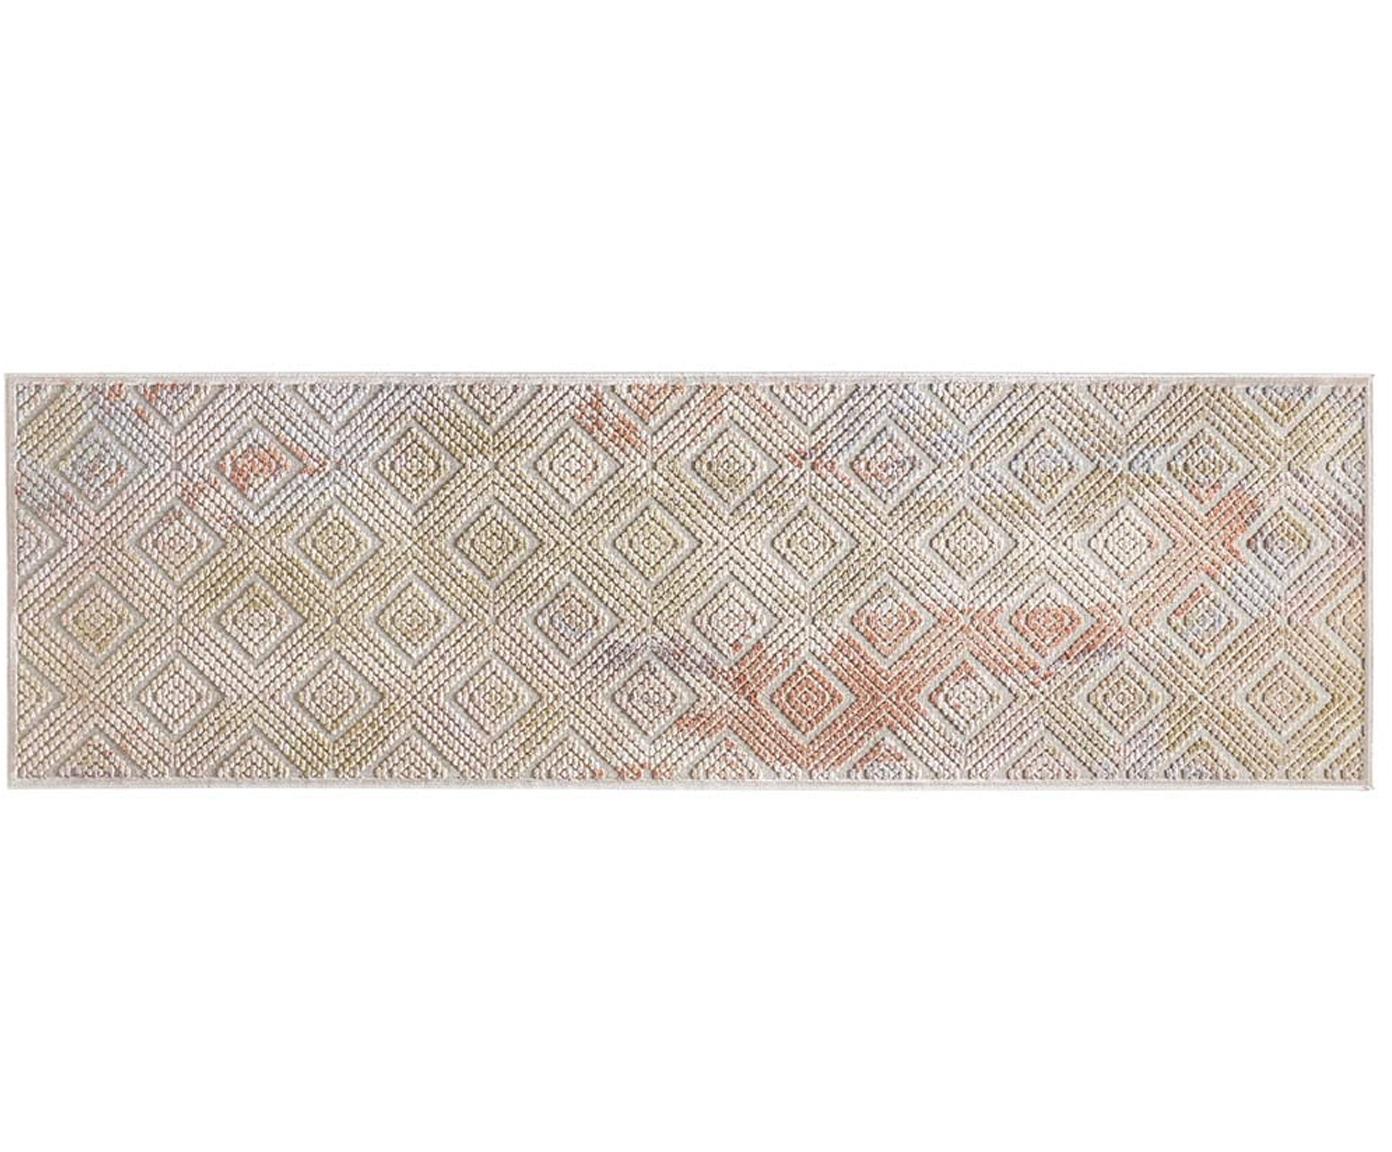 Alfombra de viscosa texturizada Isère, Parte superior: 90%viscosa, 10%poliéste, Reverso: yute, Plateado, multicolor, An 80 x L 250 cm